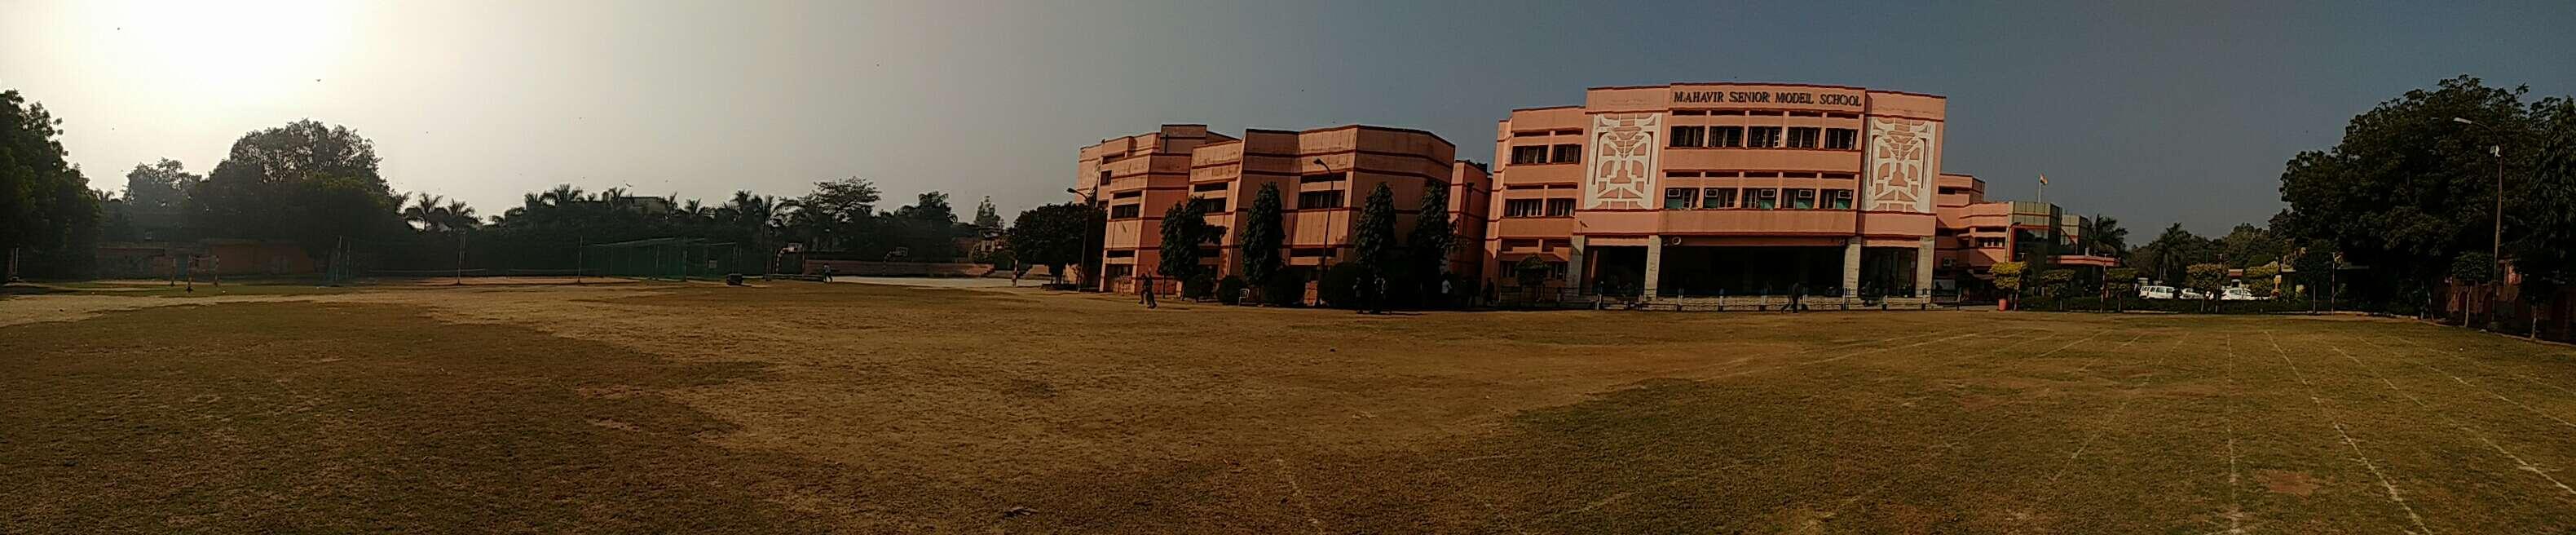 MAHAVIR SR MODEL SCHOOL SANGAM PARK EXTN G T KARNAL ROAD DELHI 2730130